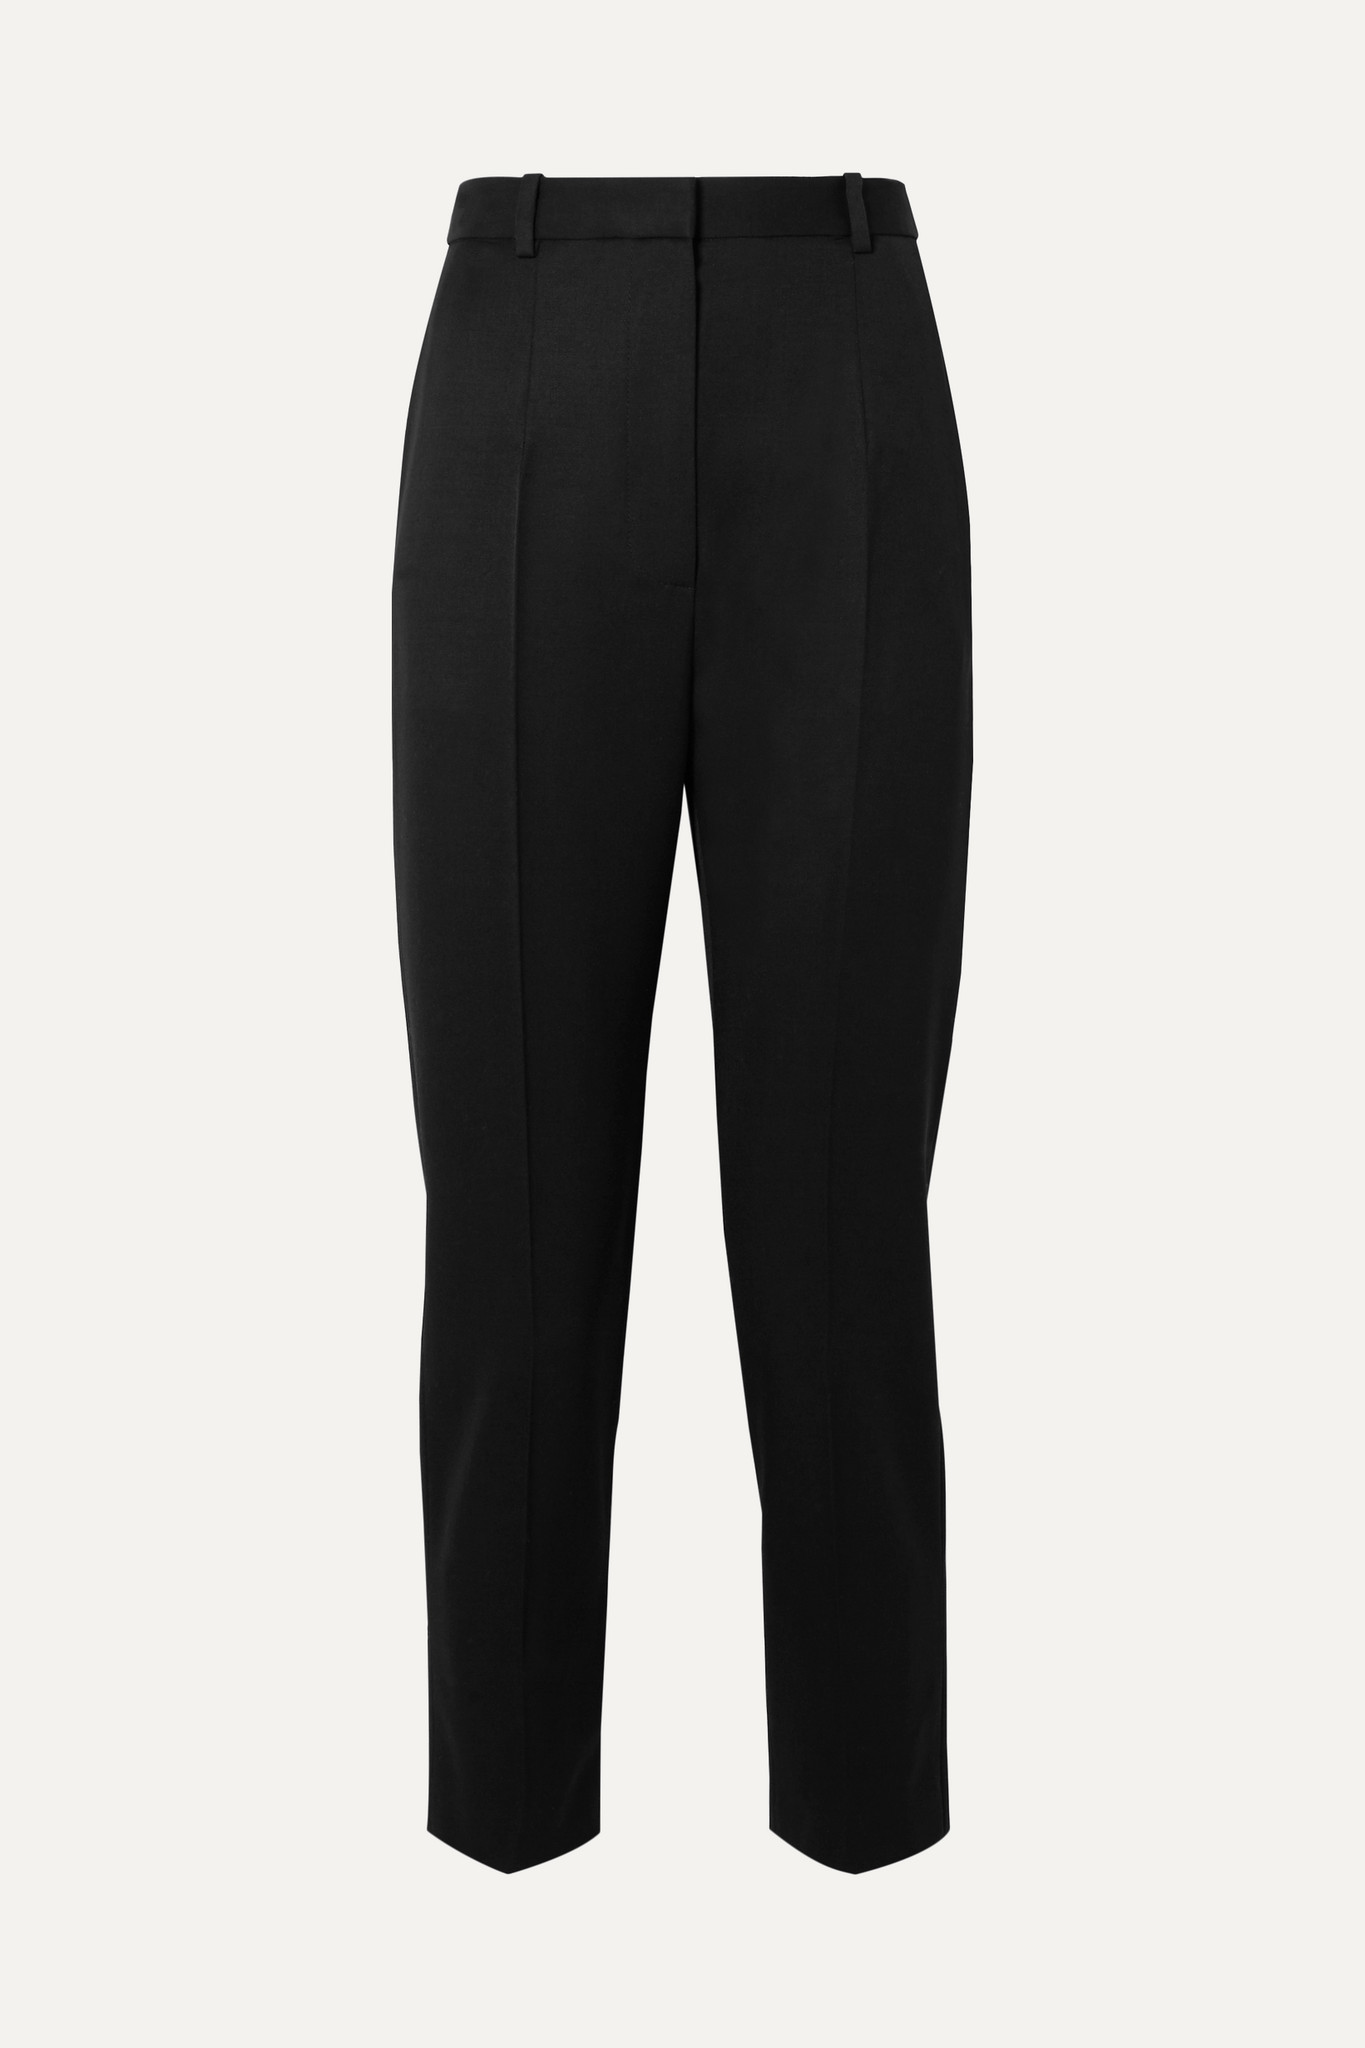 ALEXANDER MCQUEEN - Wool Straight-leg Pants - Black - IT46